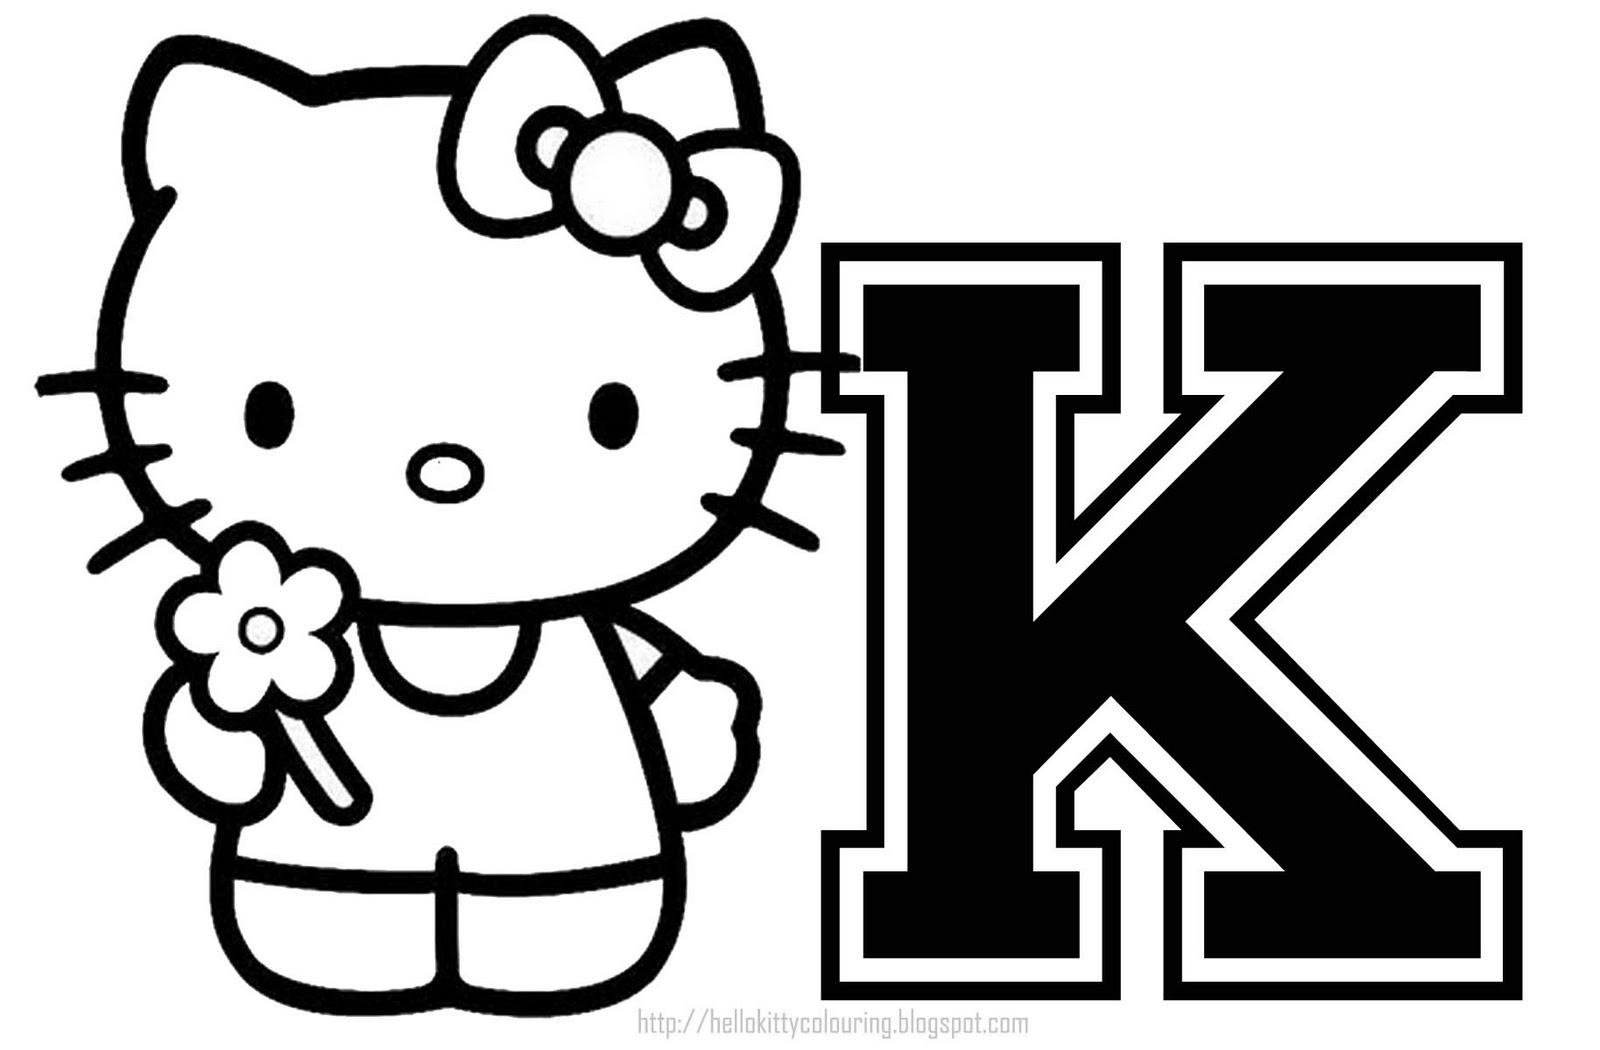 Hello Kitty - Hello Kitty Individual Letters A Z - Free Printable Hello Kitty Alphabet Letters